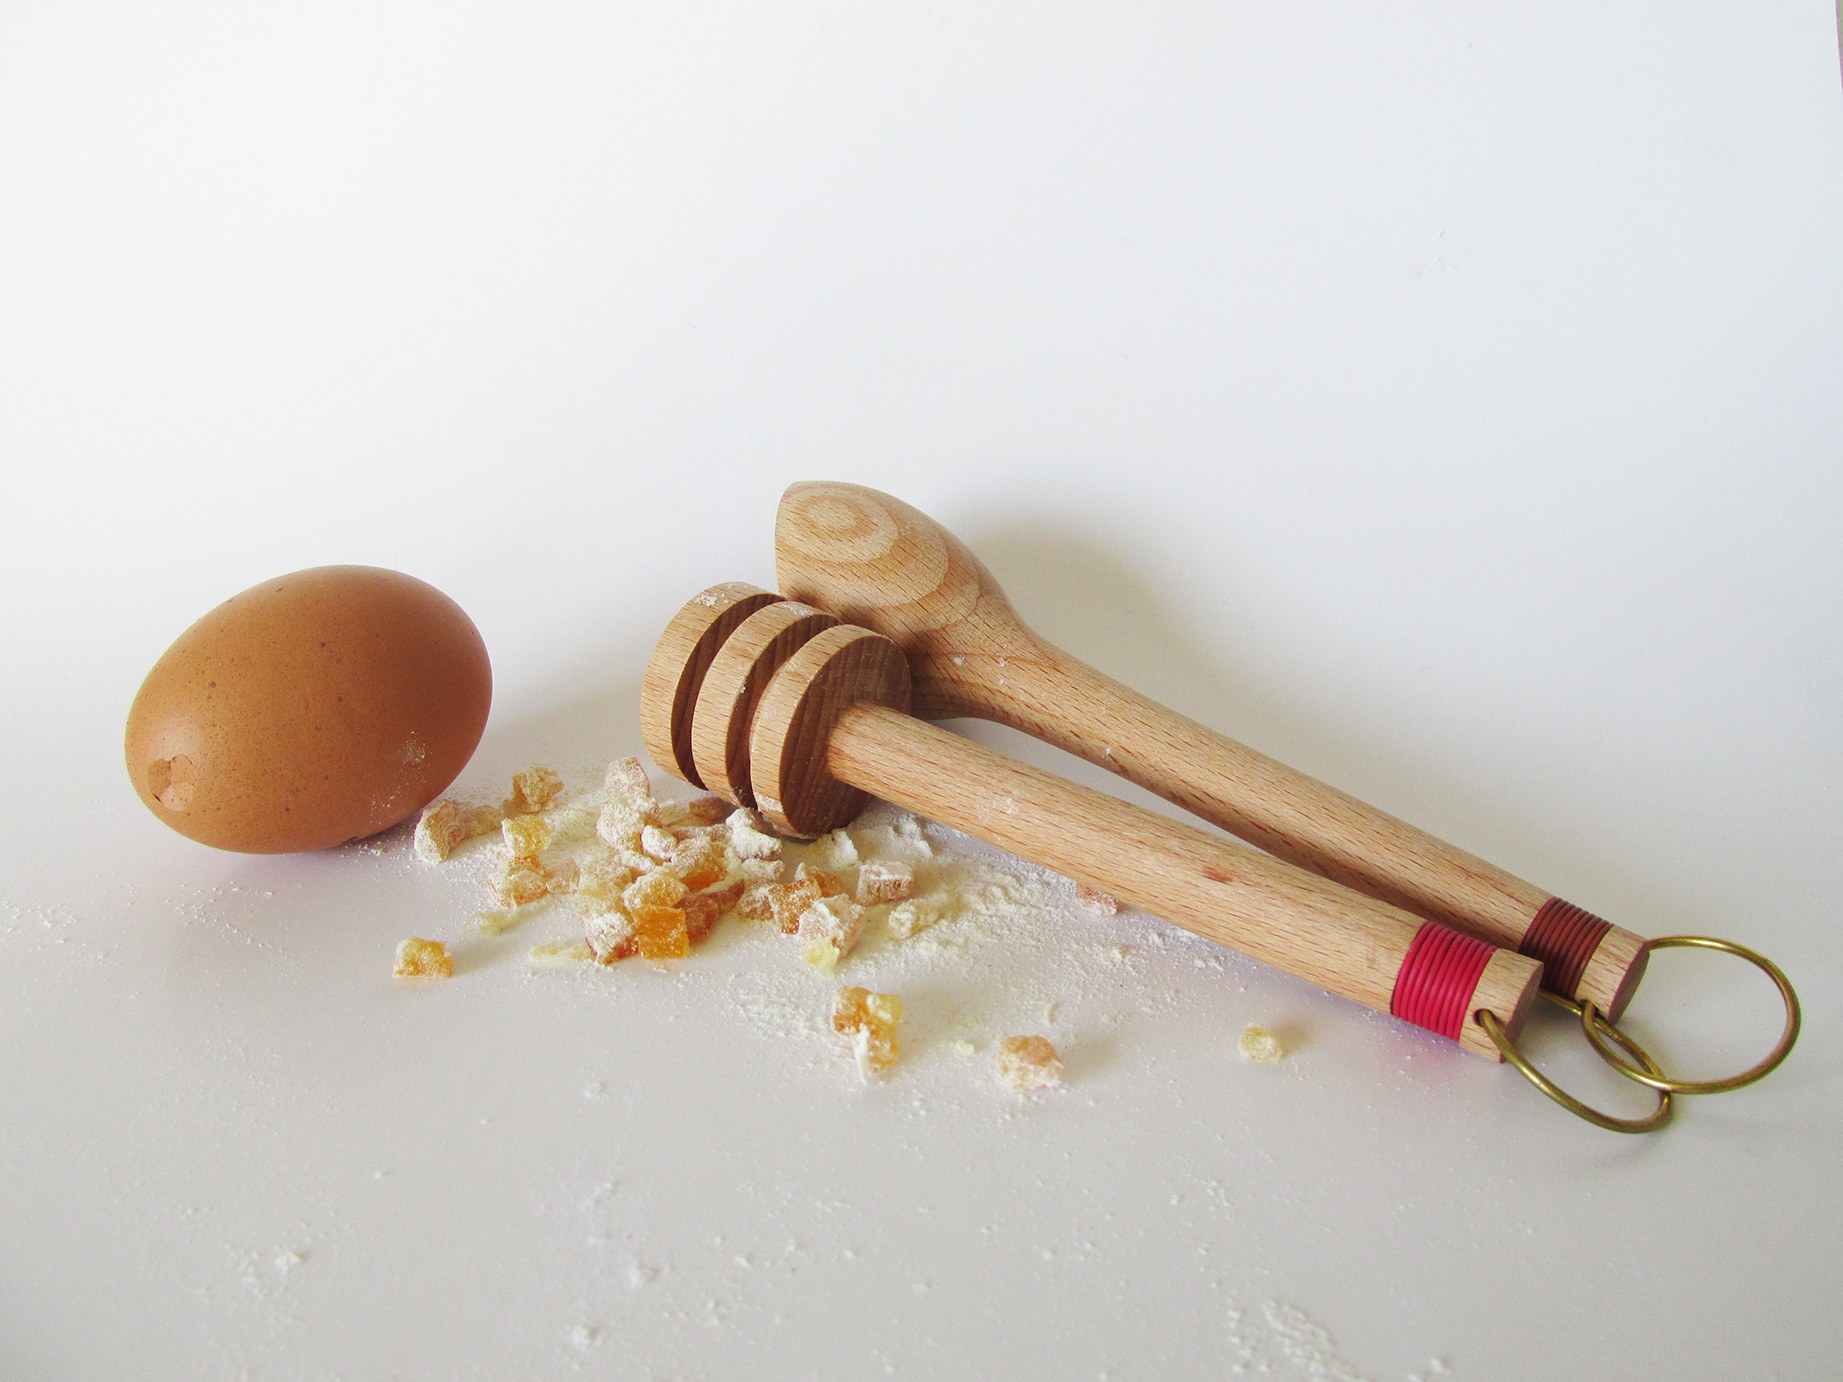 hand made wood turned utensils